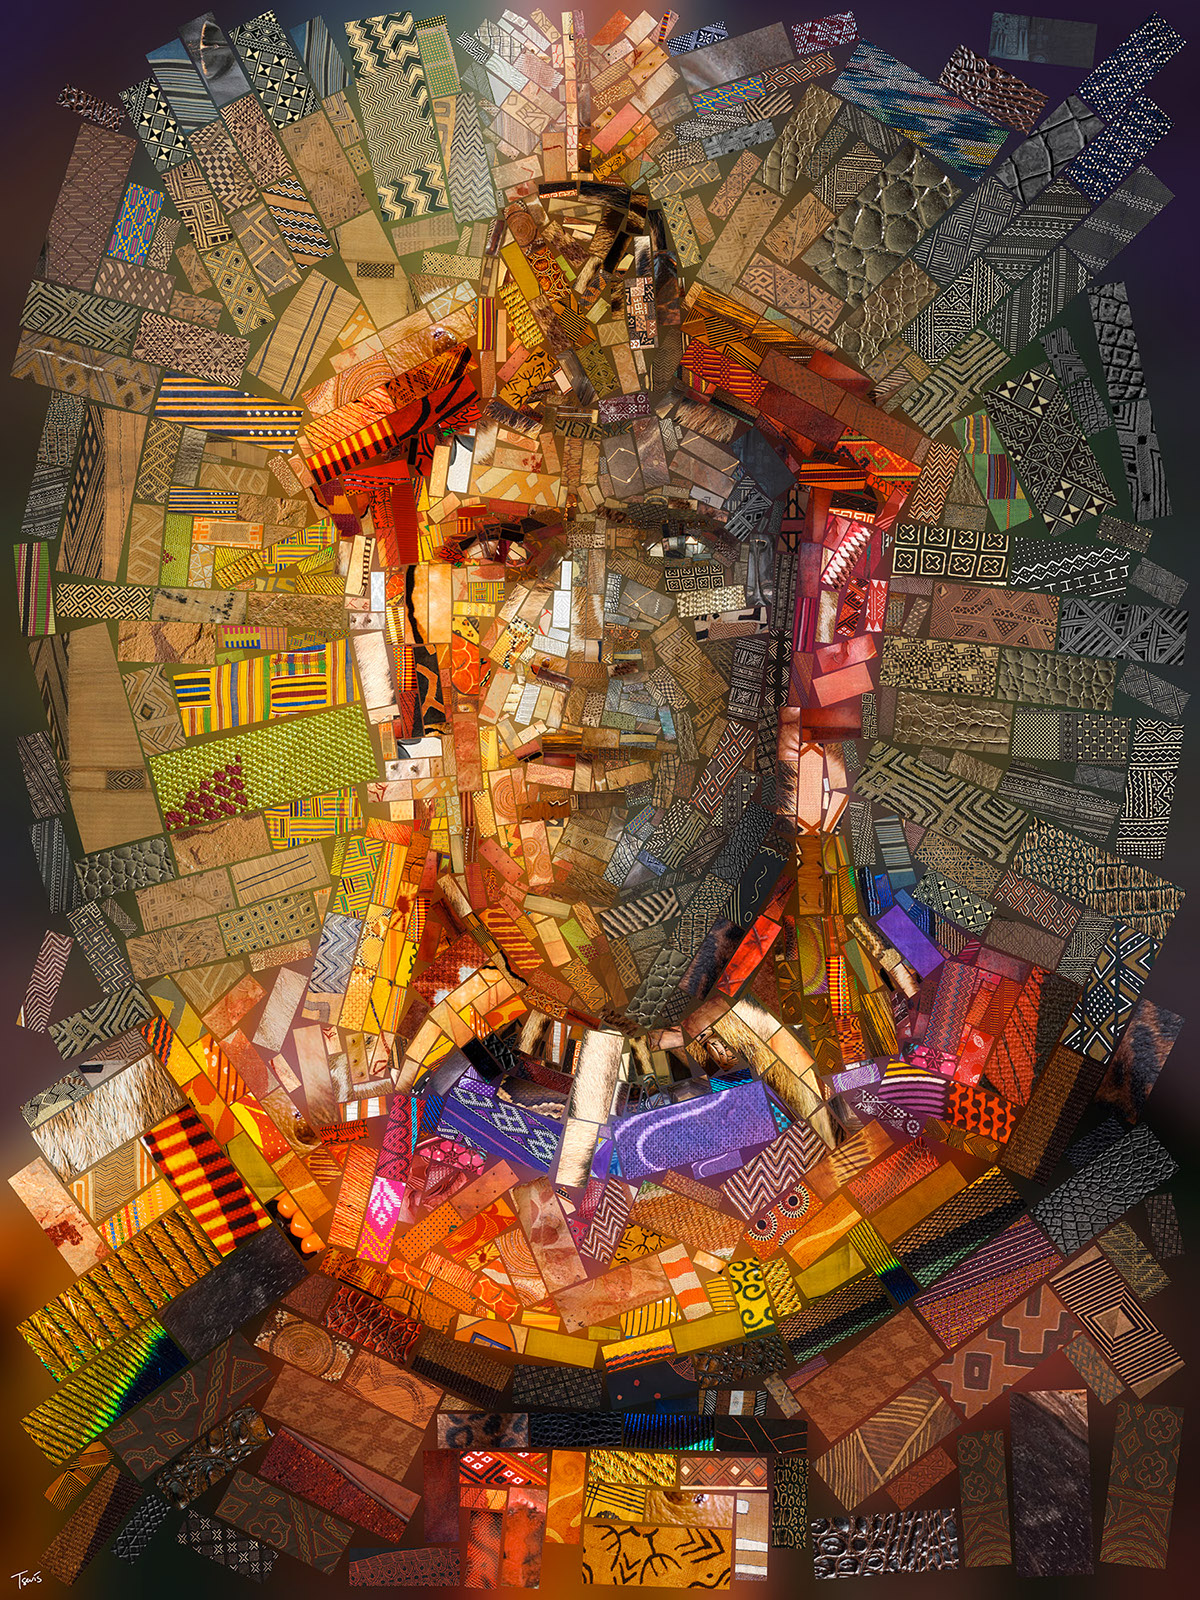 Splendid Mosaic Illustrations by Charis Tsevis